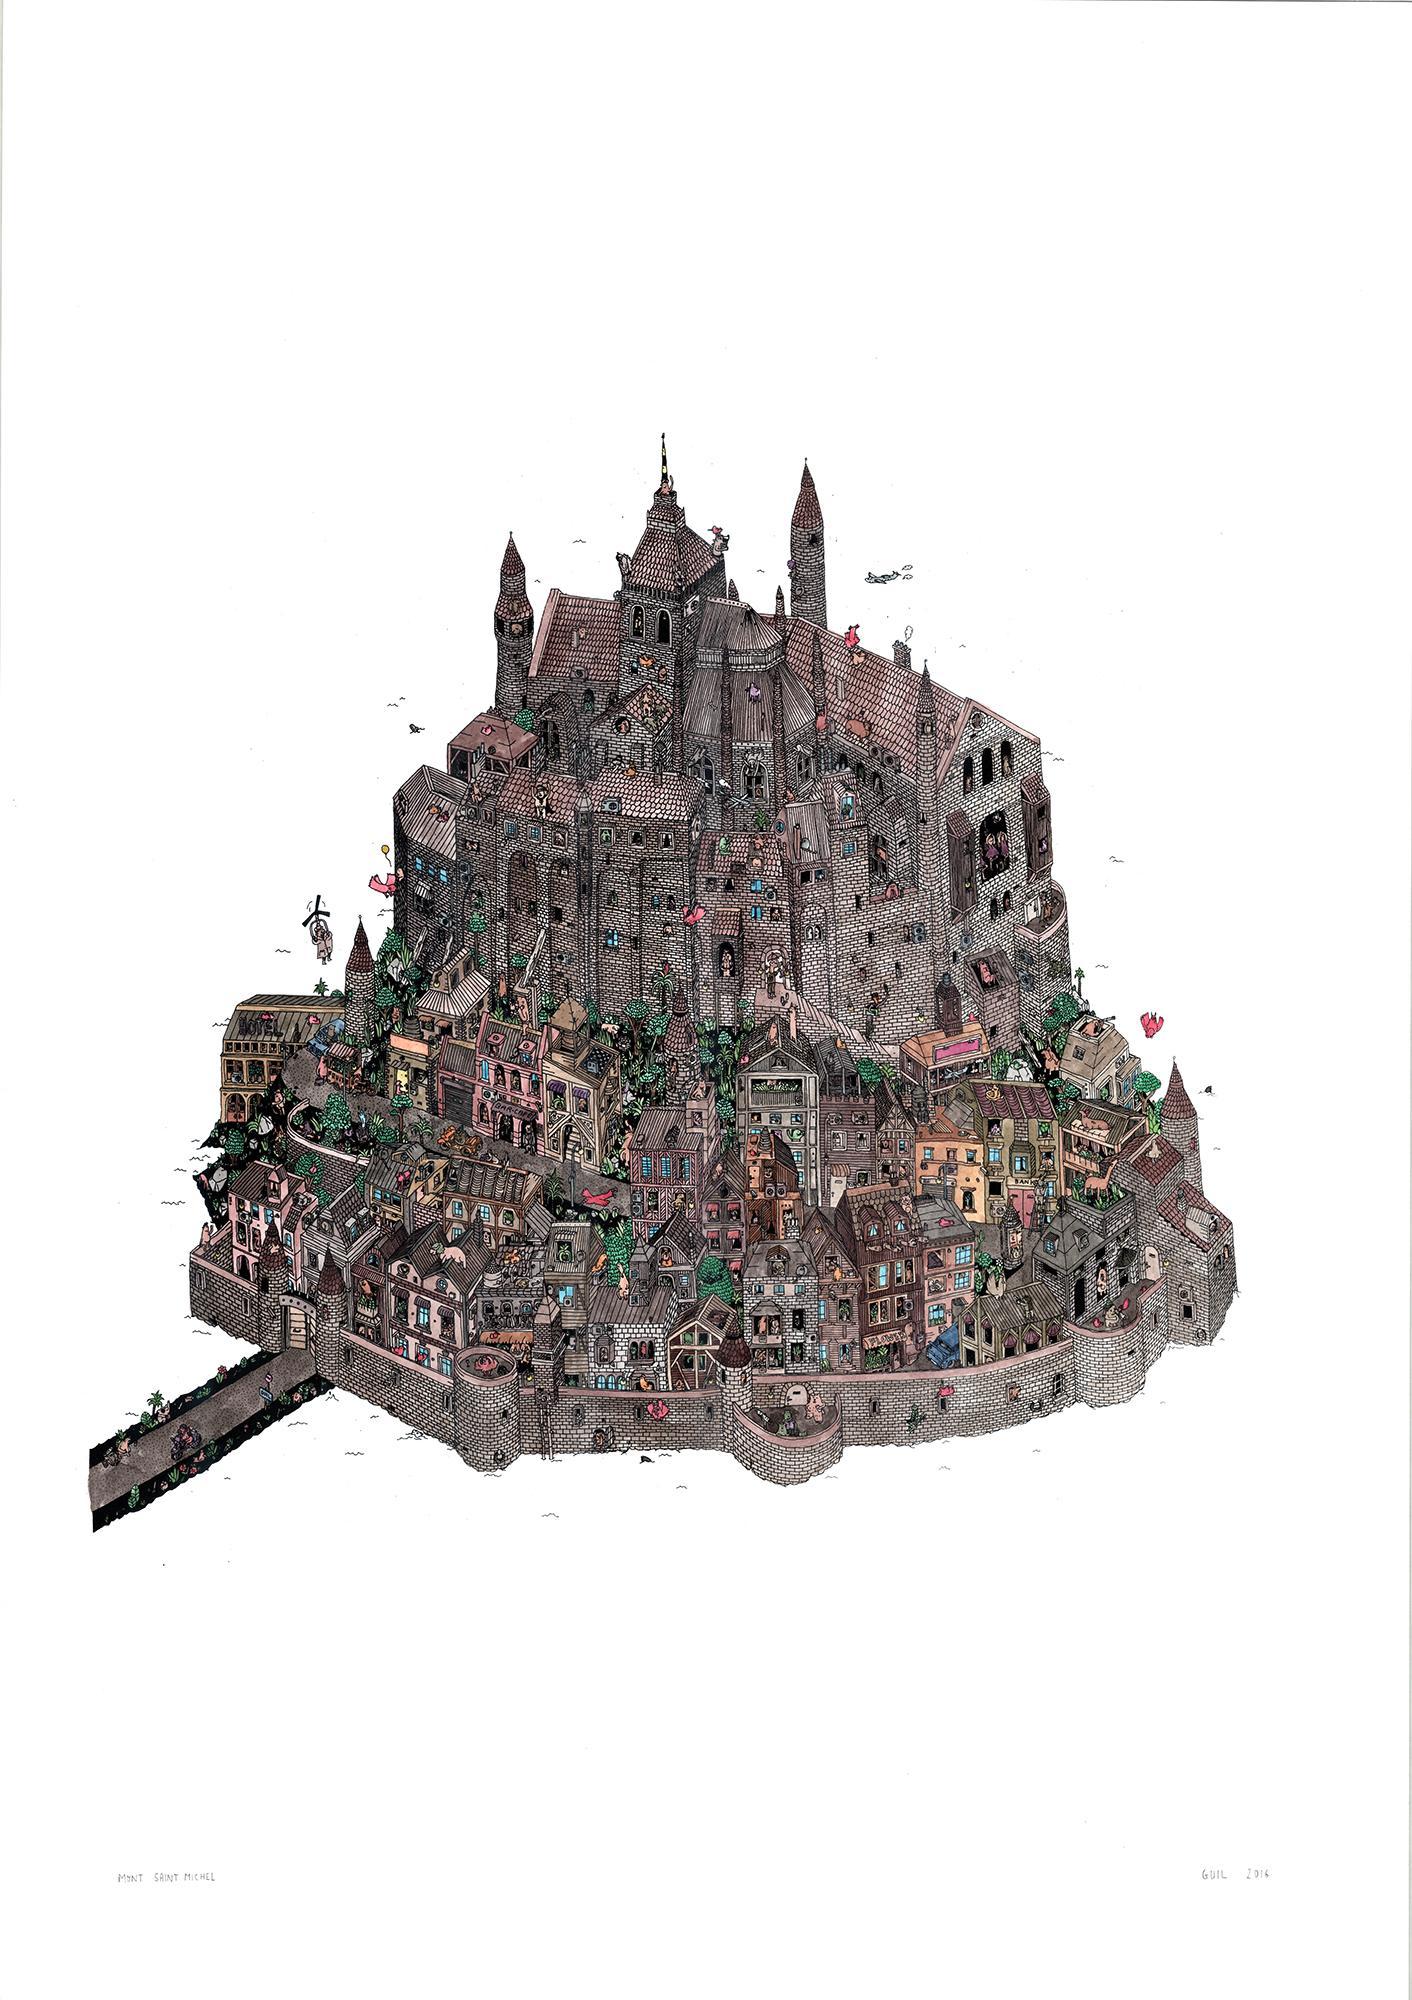 Mont Saint Michel, fantastic watercolor illustration by Guillaume Cornet framed